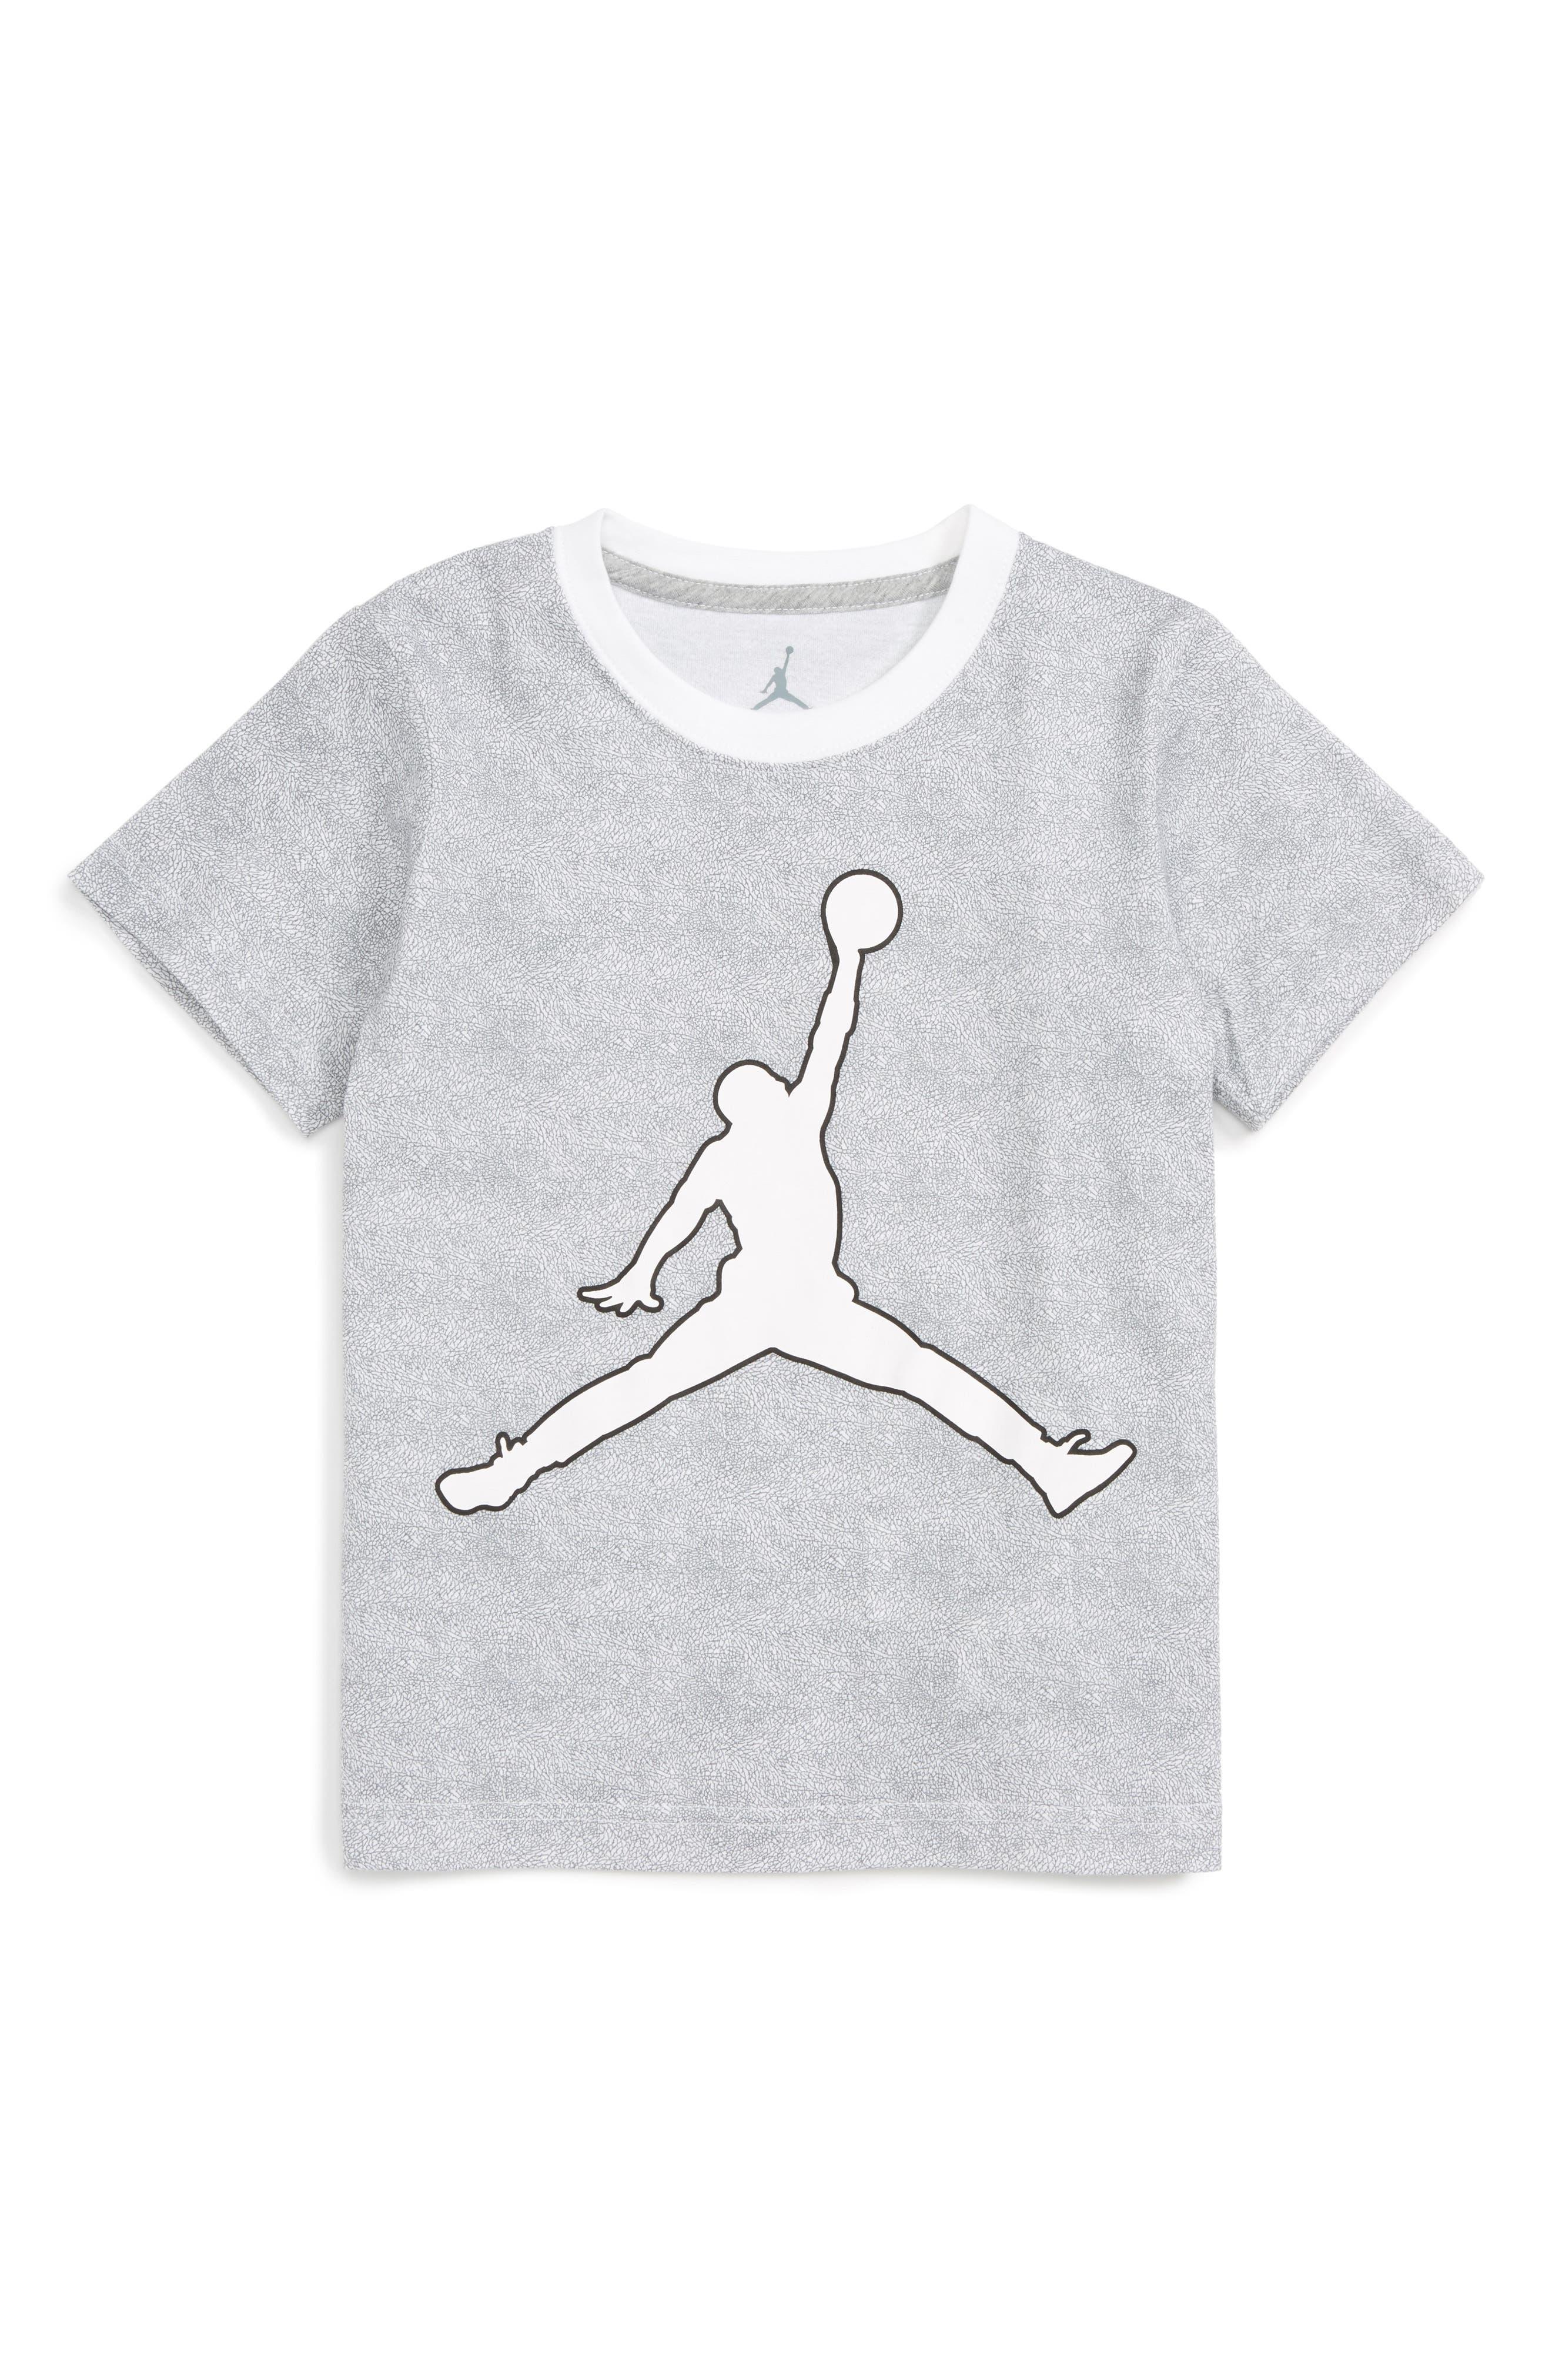 Main Image - Jordan Jumpman Graphic T-Shirt (Toddler Boys & Little Boys)